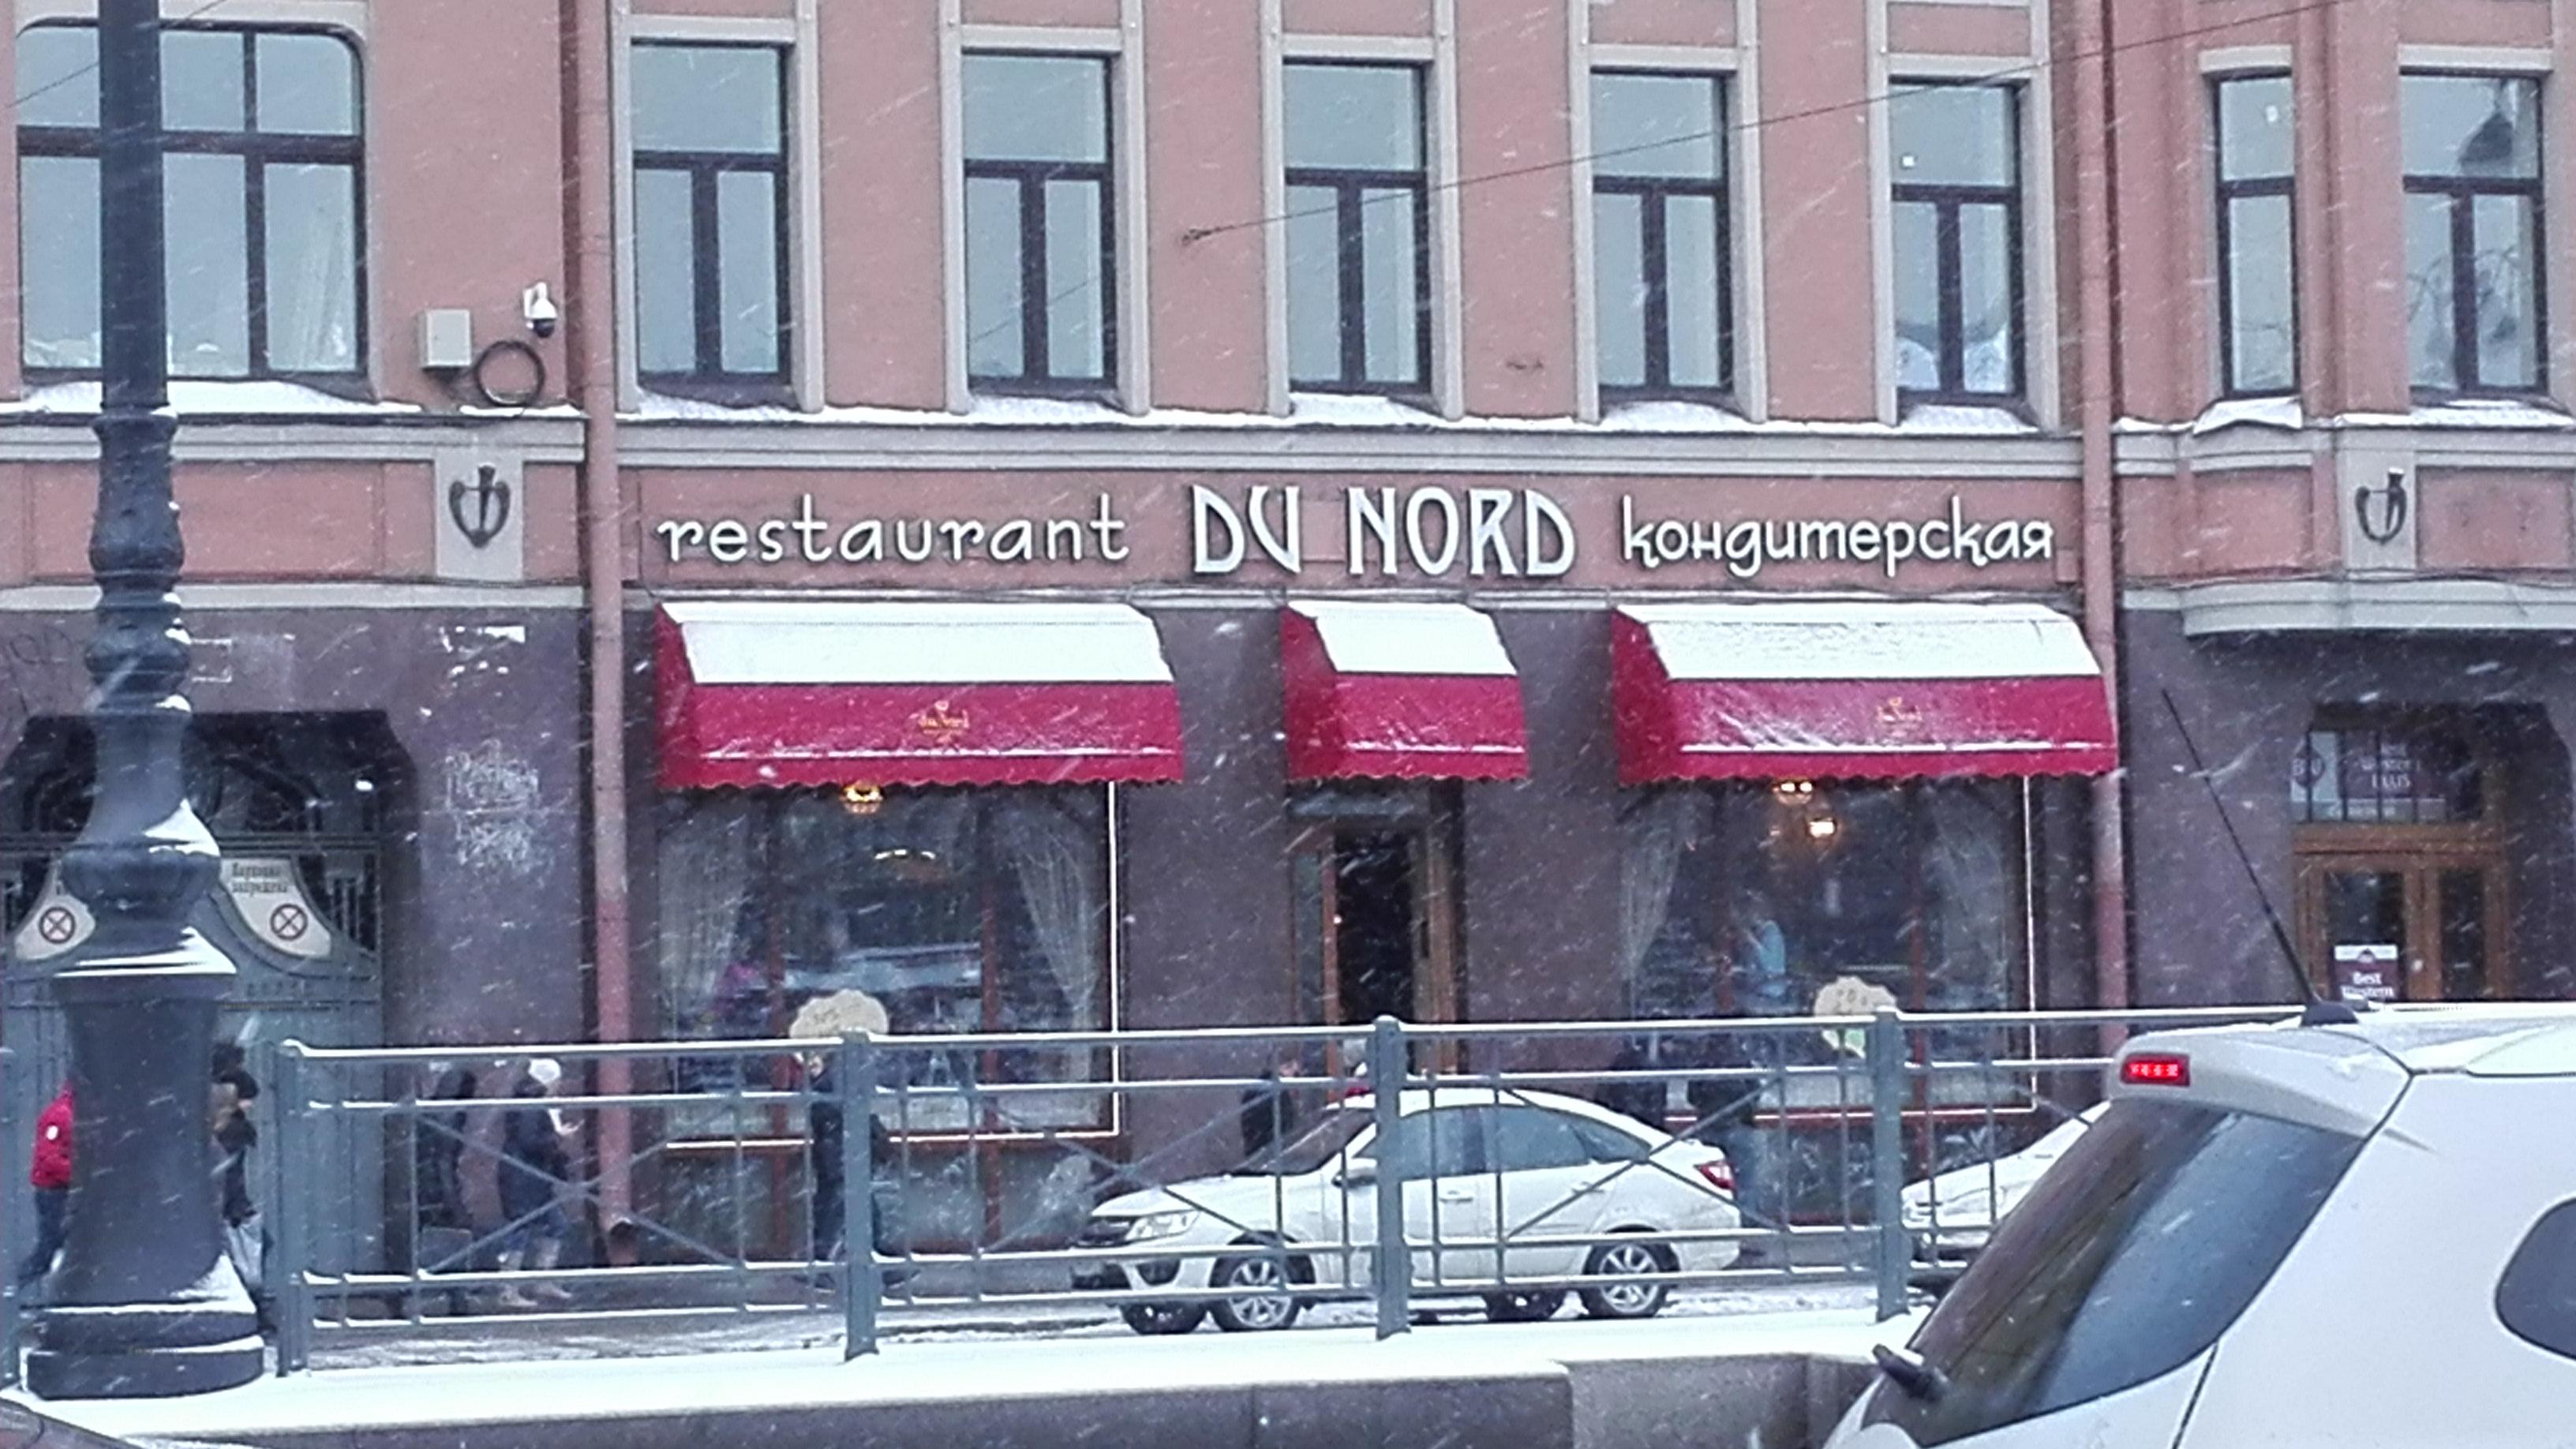 Санкт-Петербург. Кафе-кондитерская Дю Норд